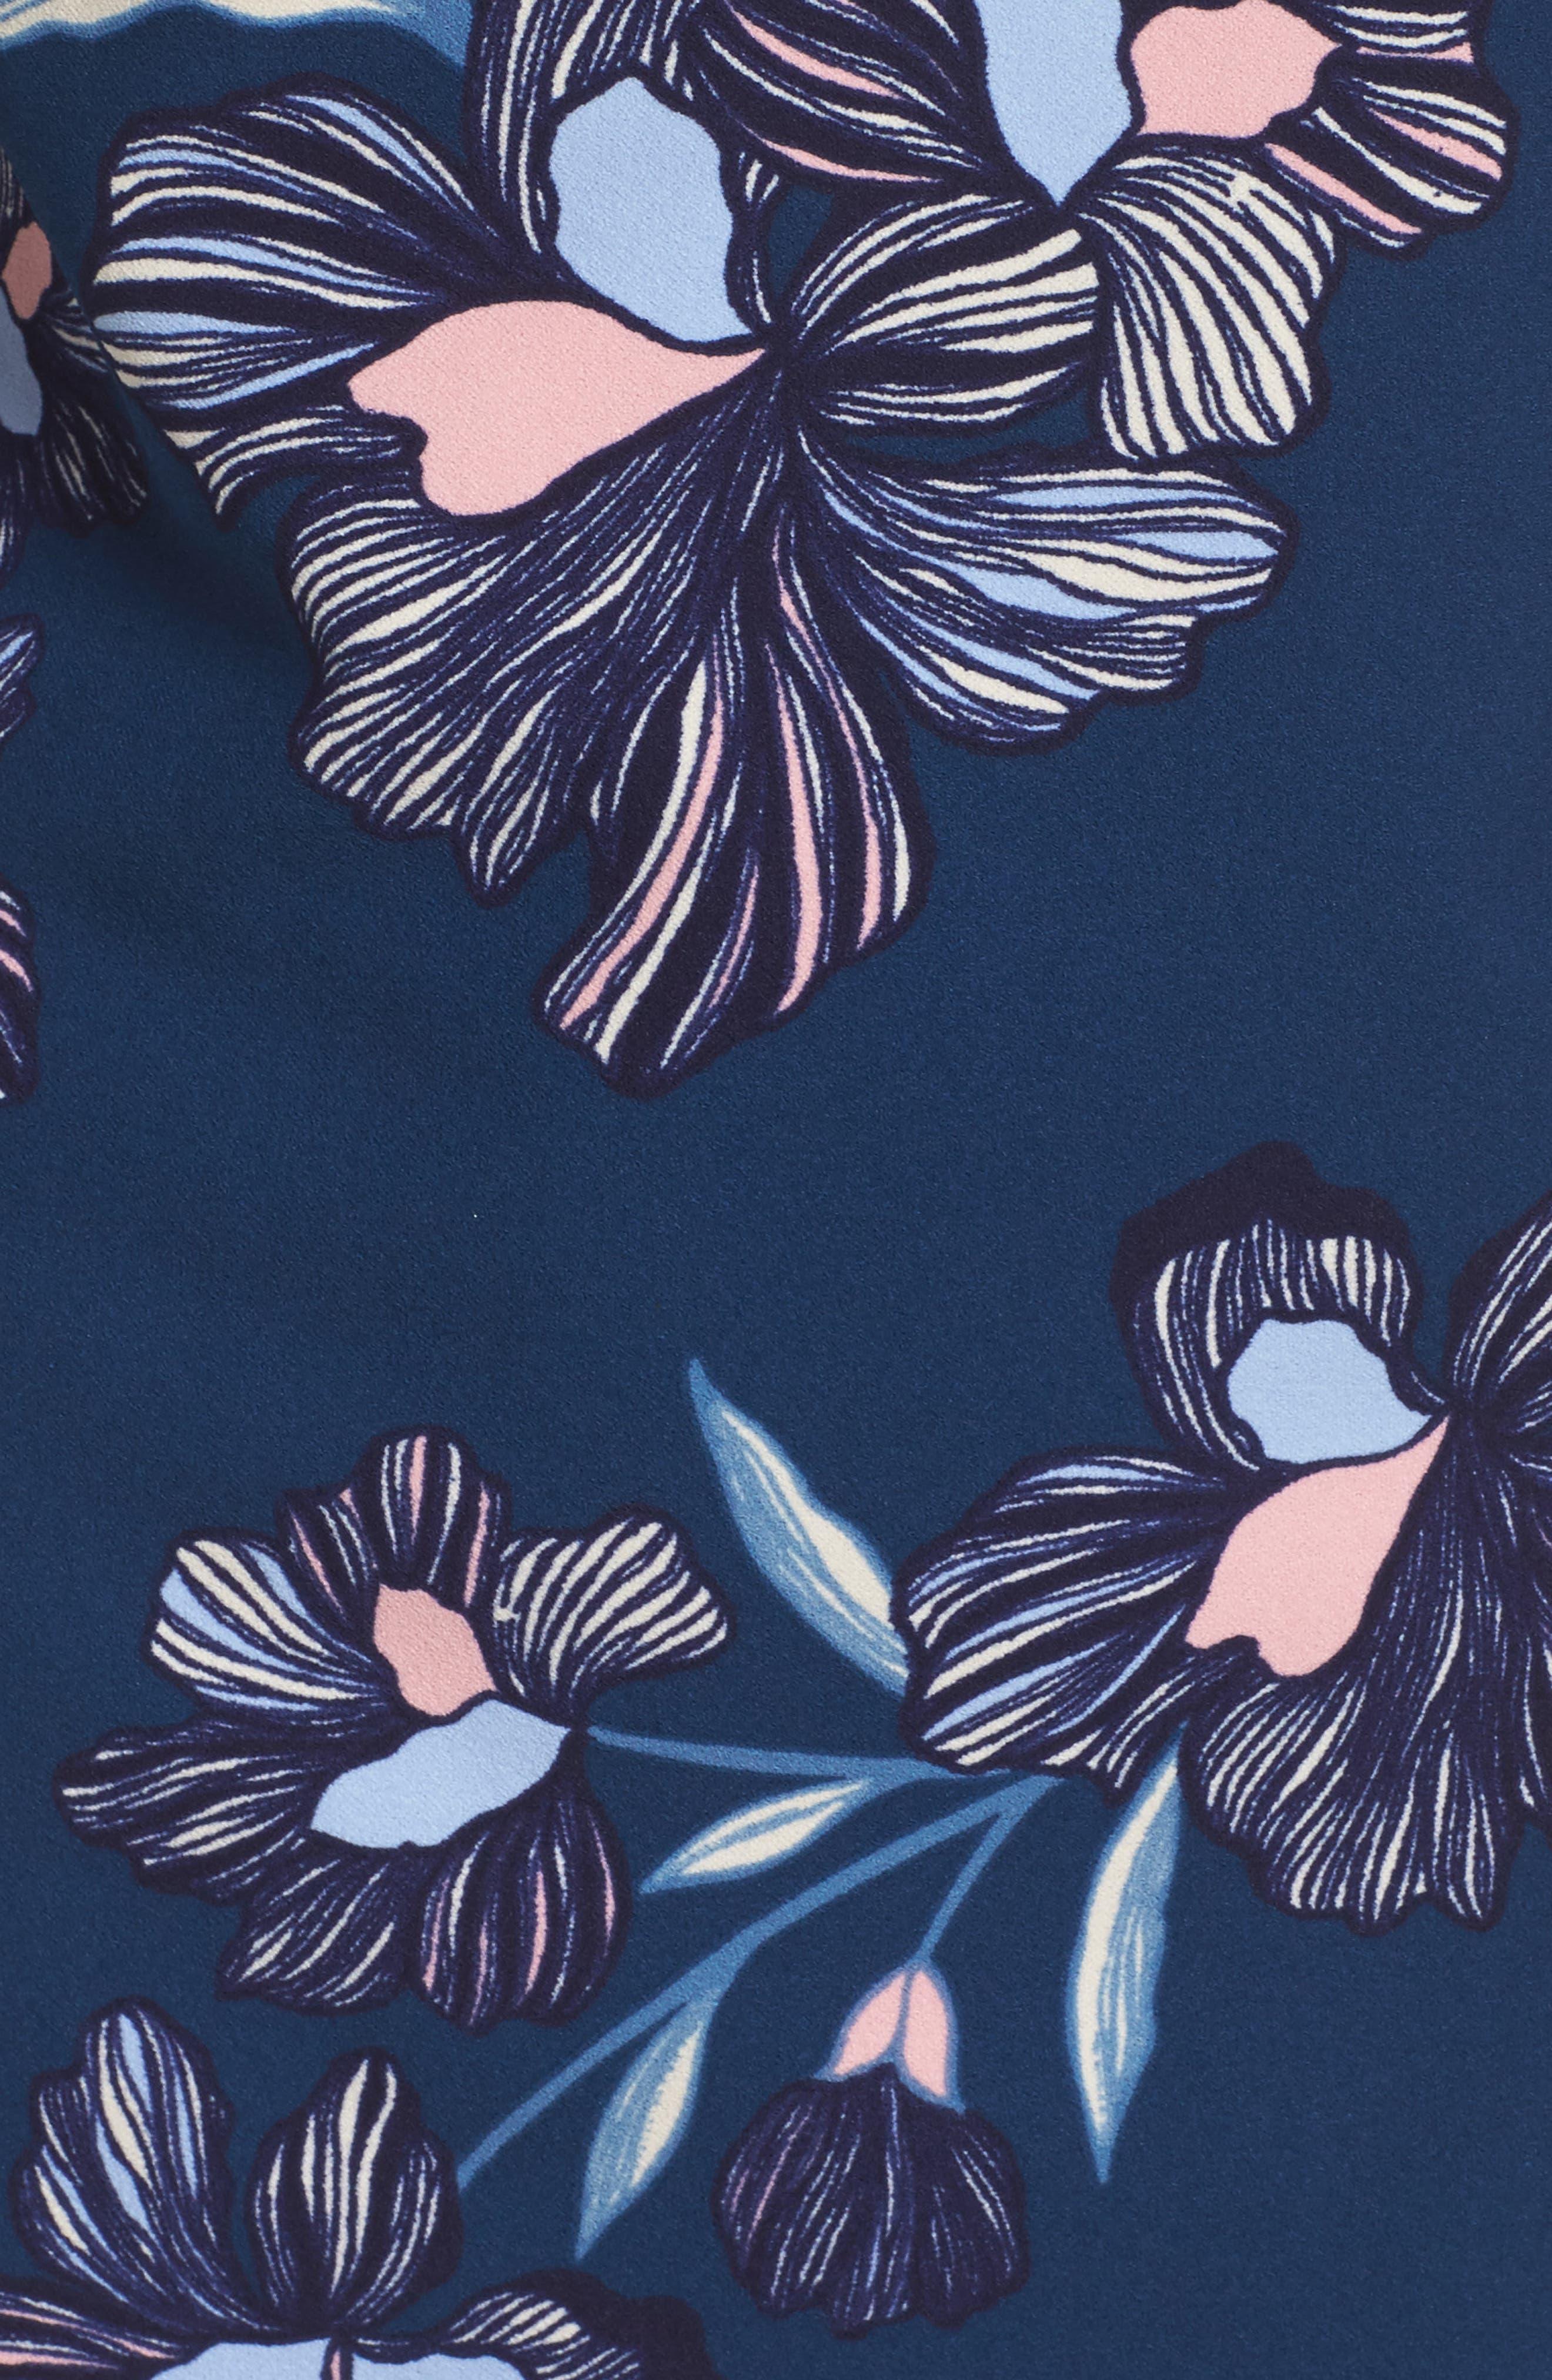 Floral Print Crepe Shift Dress,                             Alternate thumbnail 5, color,                             Navy Multi